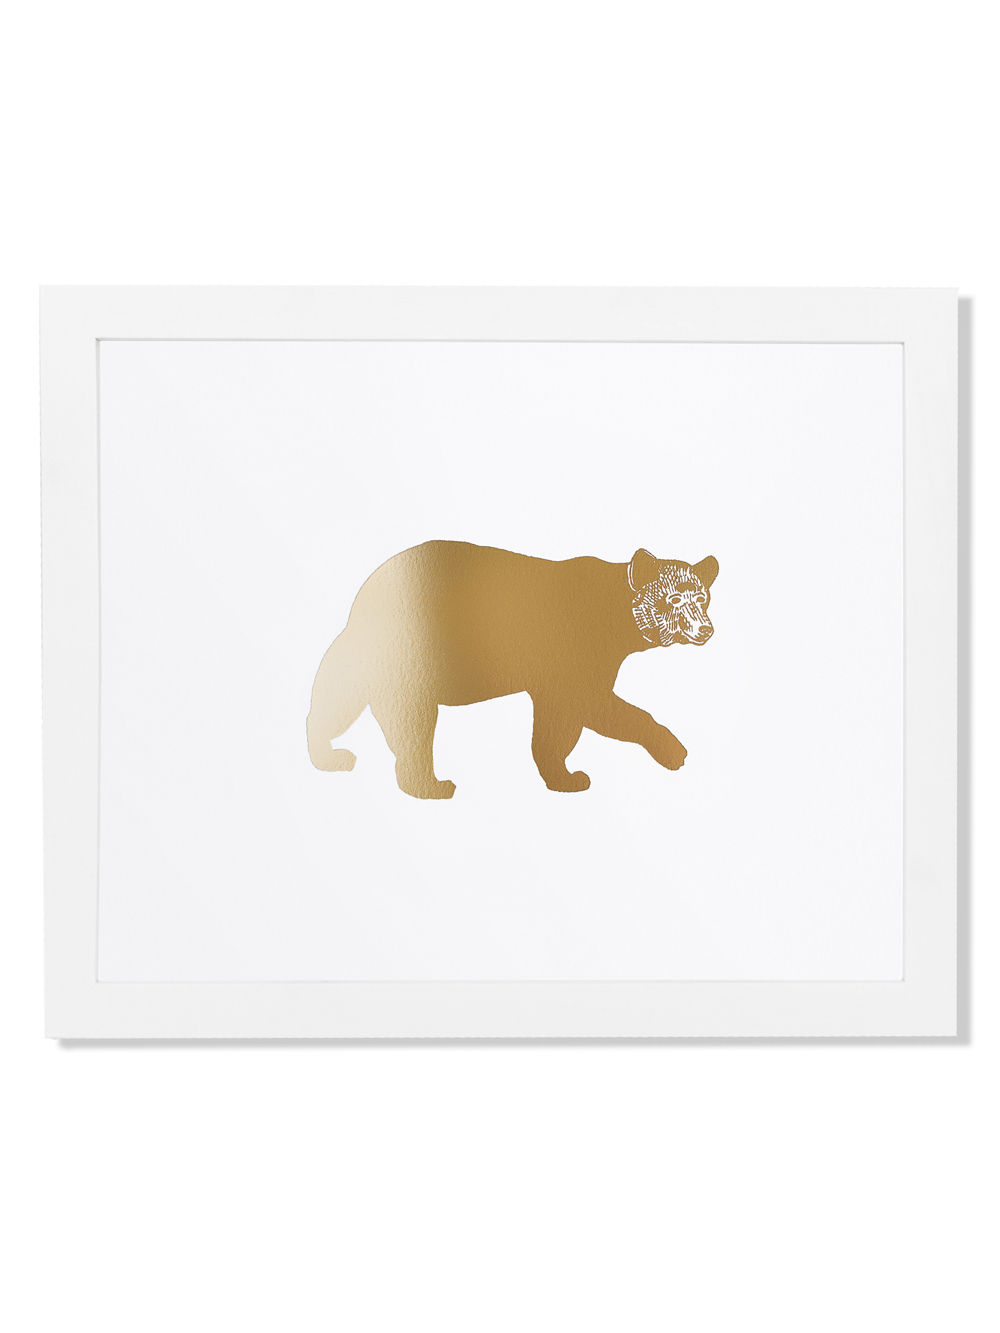 fp012-animal-bear.jpg